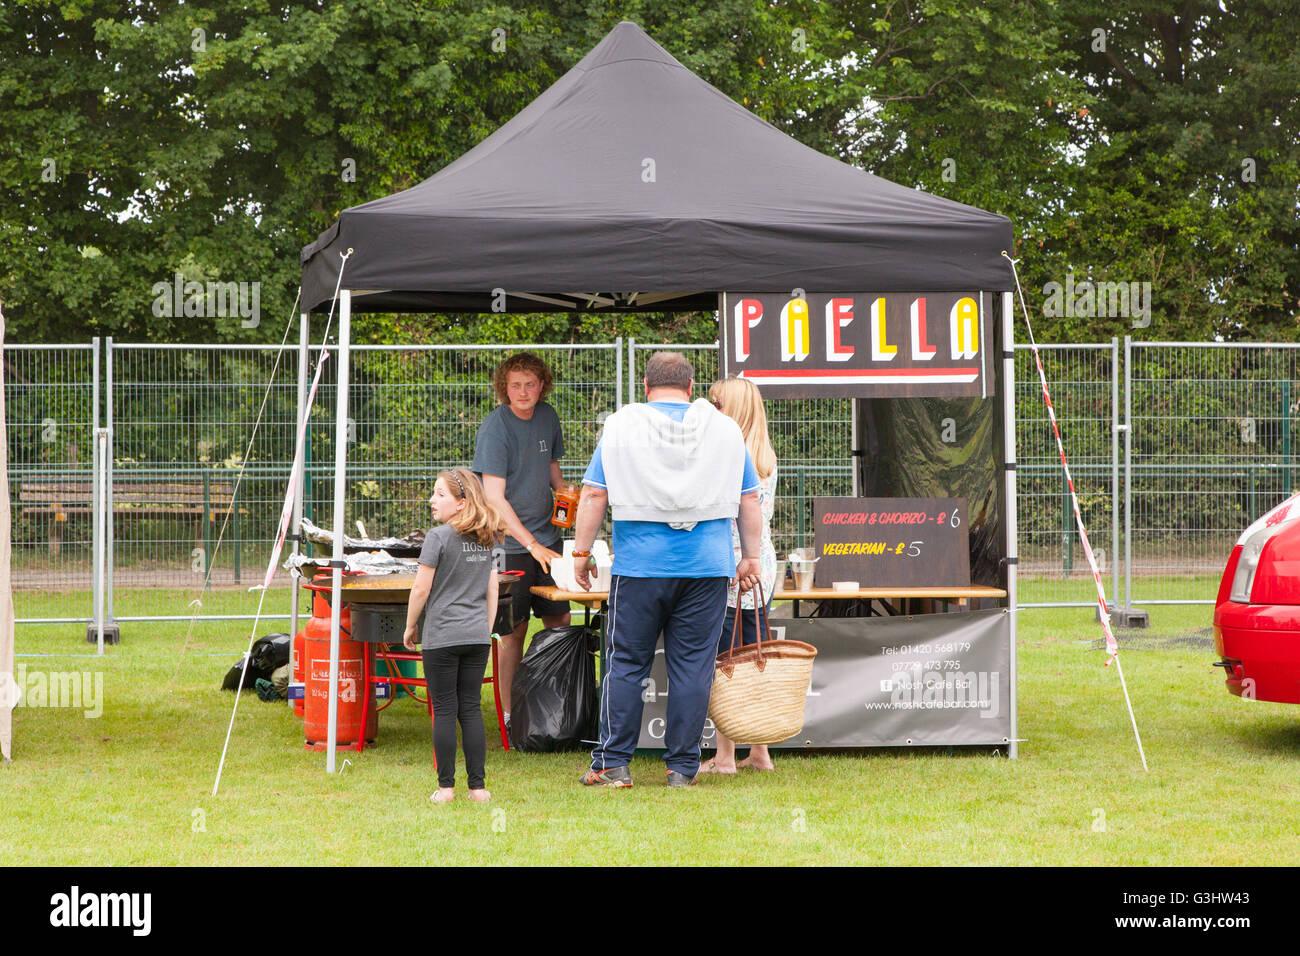 Nosh food stall at the Alresford music festival 2016, Hampshire, England, United Kingdom. - Stock Image